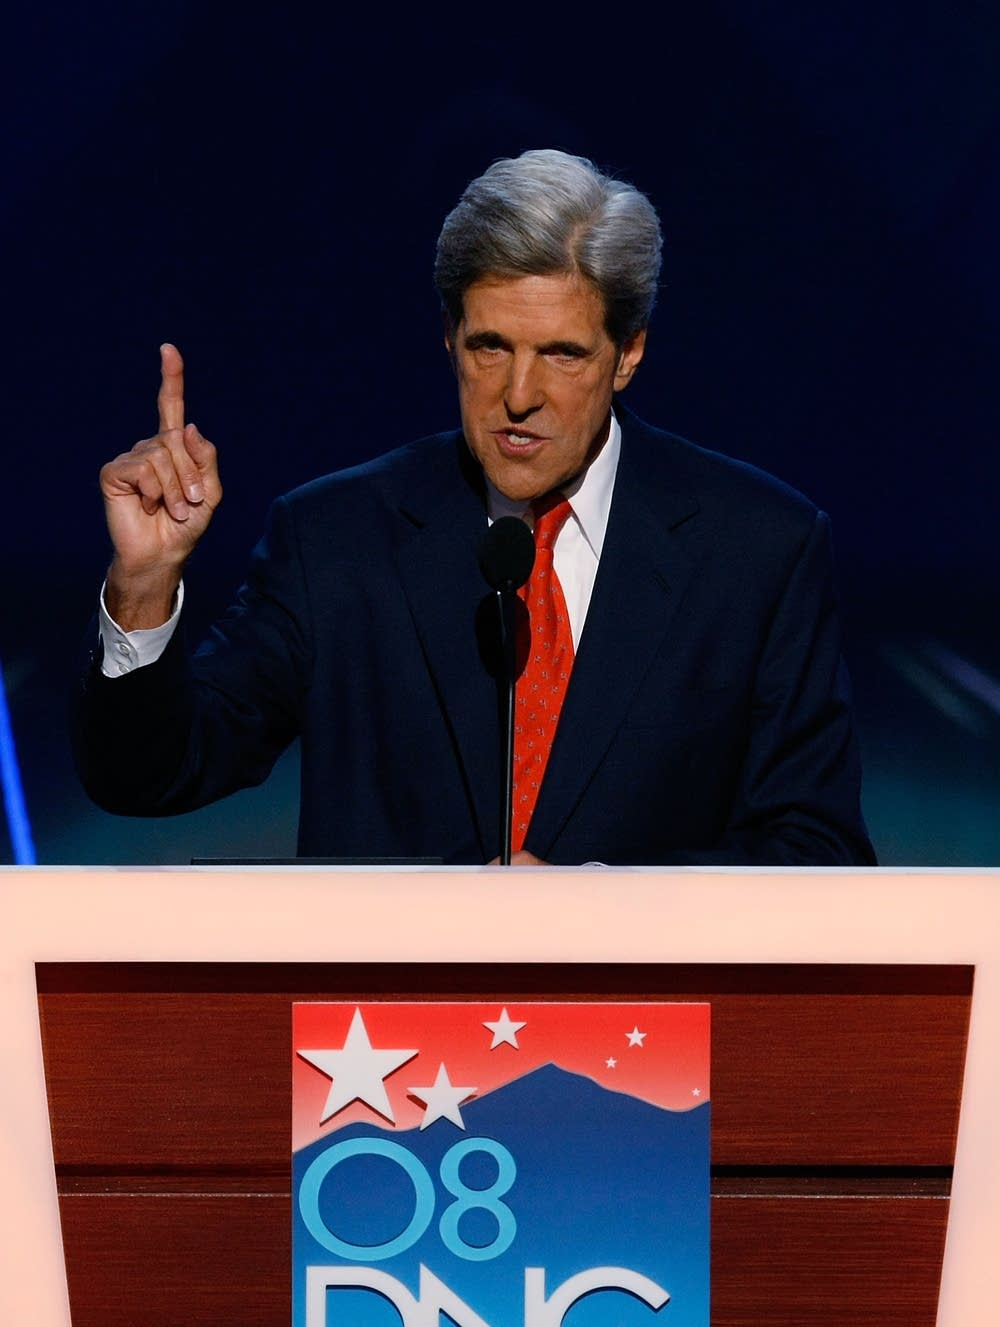 Sen. John Kerry at the DNC in Denver